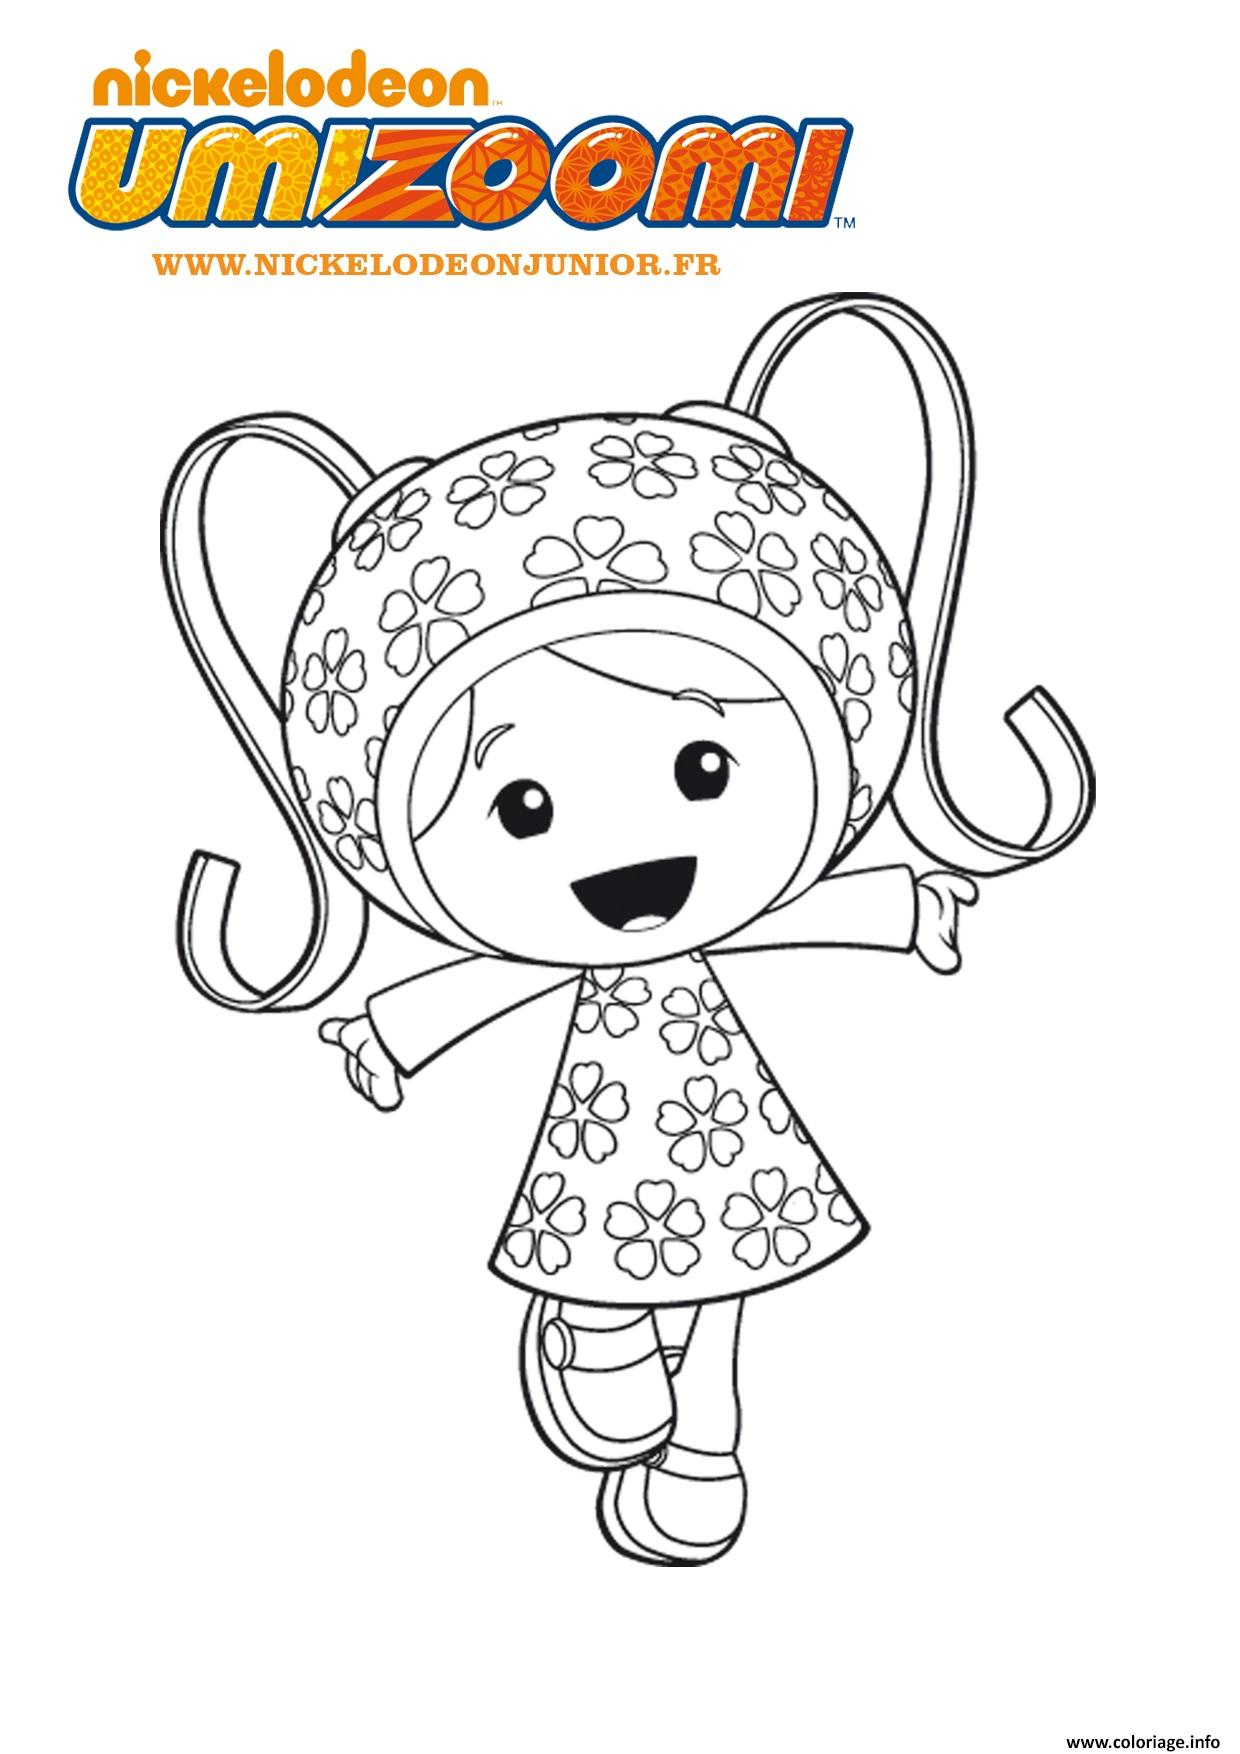 Coloriage fille umizoomi 2 dessin - Coloriage d une fille ...